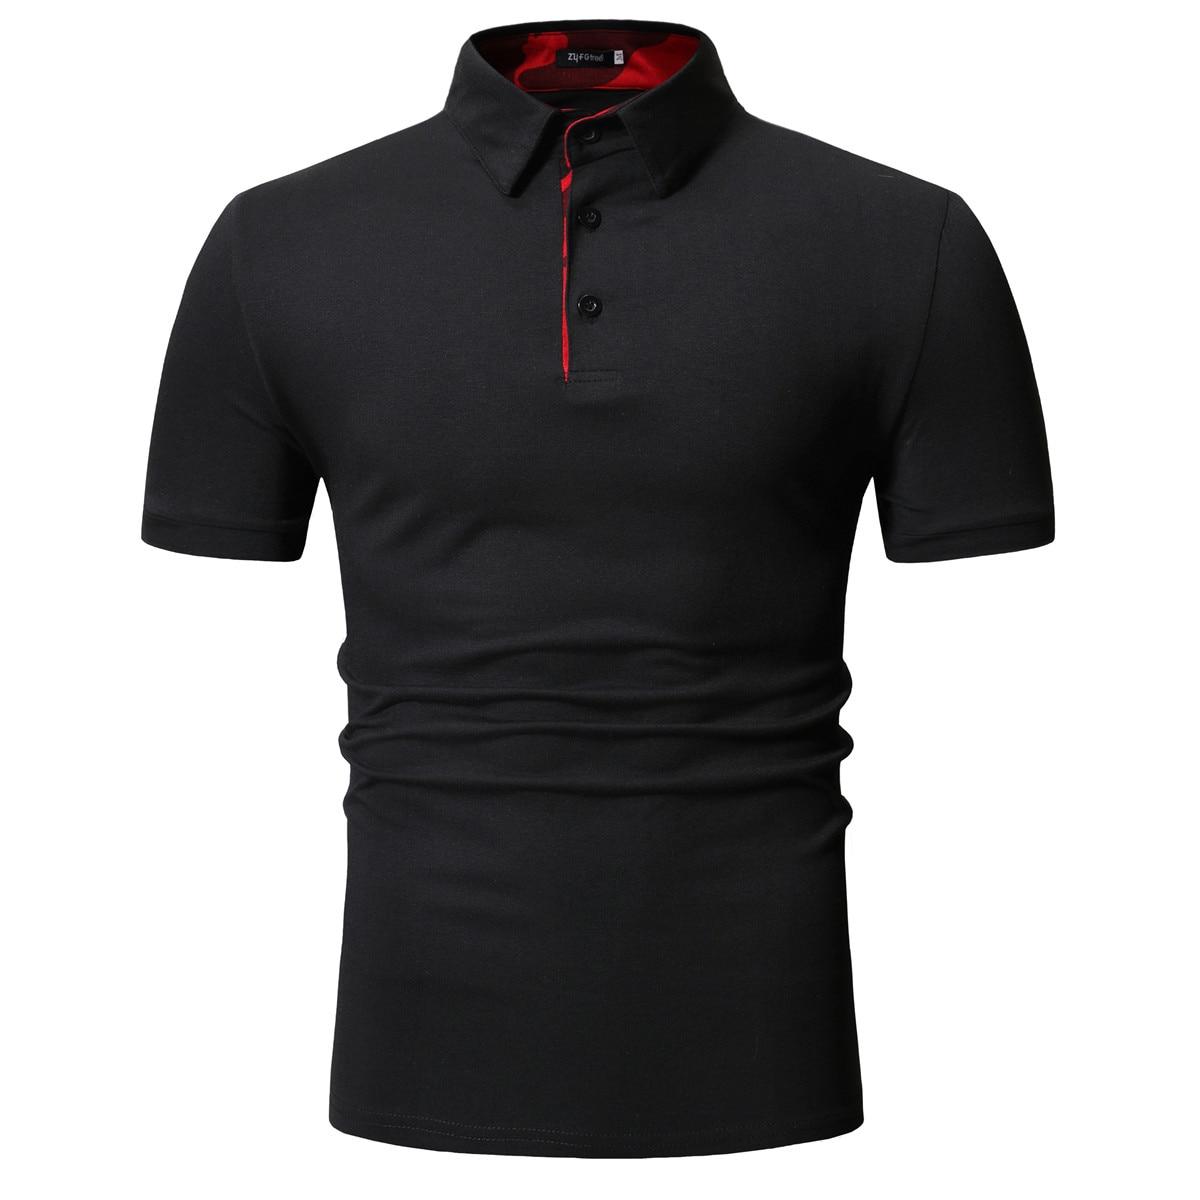 Men   Polo   Shirt 2019 New Men's Plain Slim Cotton Casual Short-sleeve   POLO   Shirt